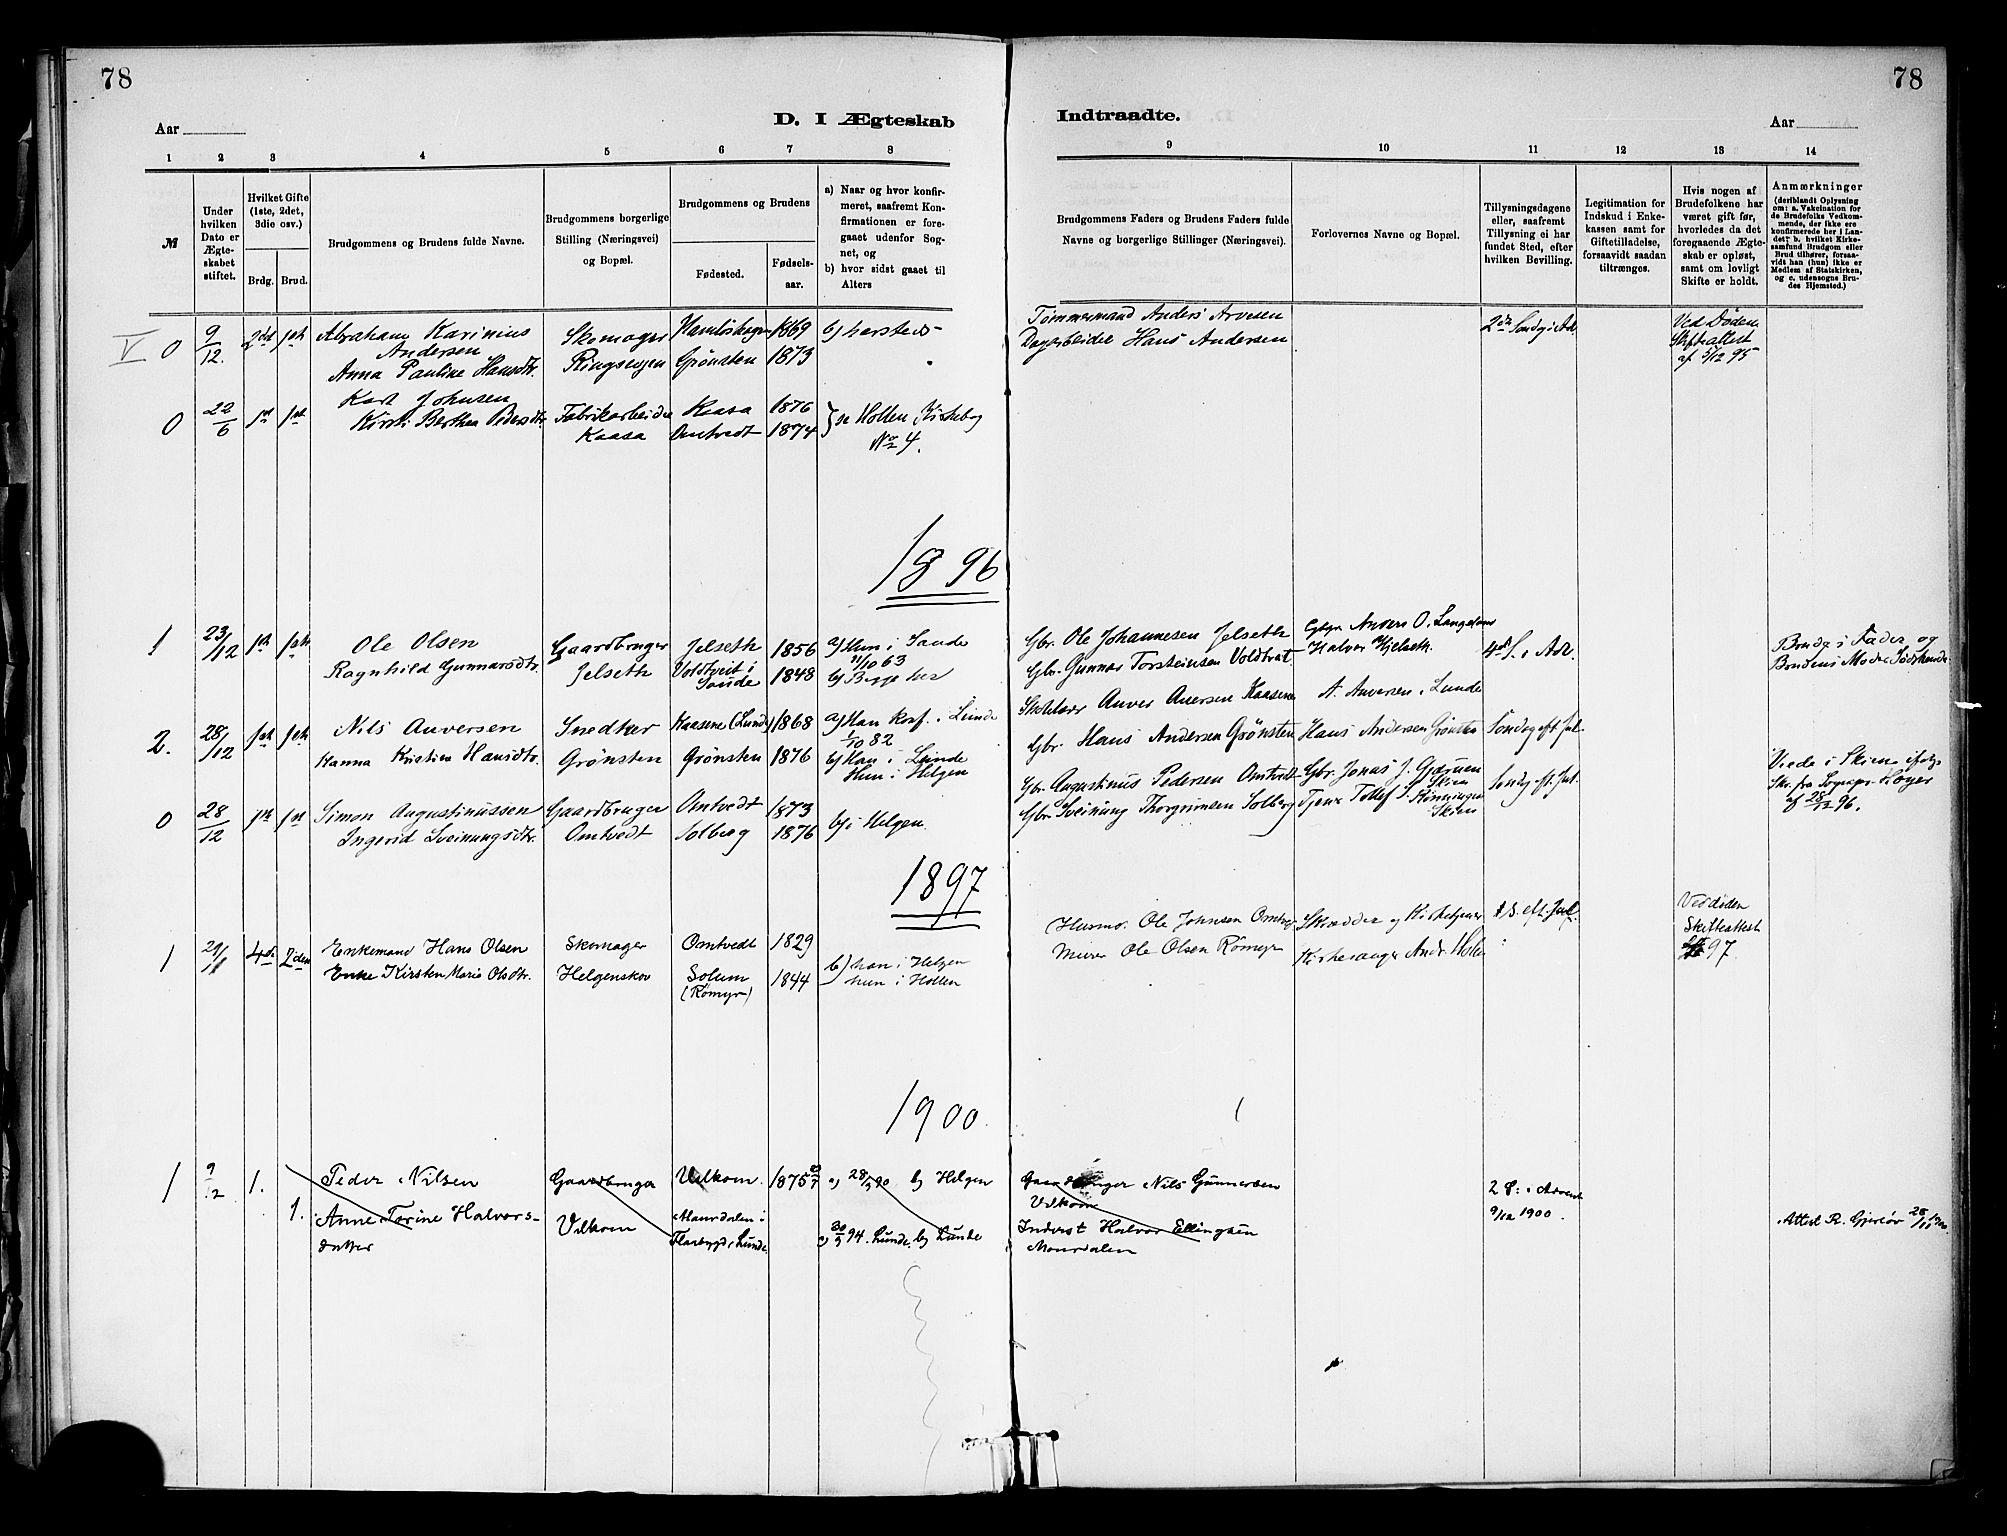 SAKO, Holla kirkebøker, F/Fa/L0009: Ministerialbok nr. 9, 1881-1897, s. 78